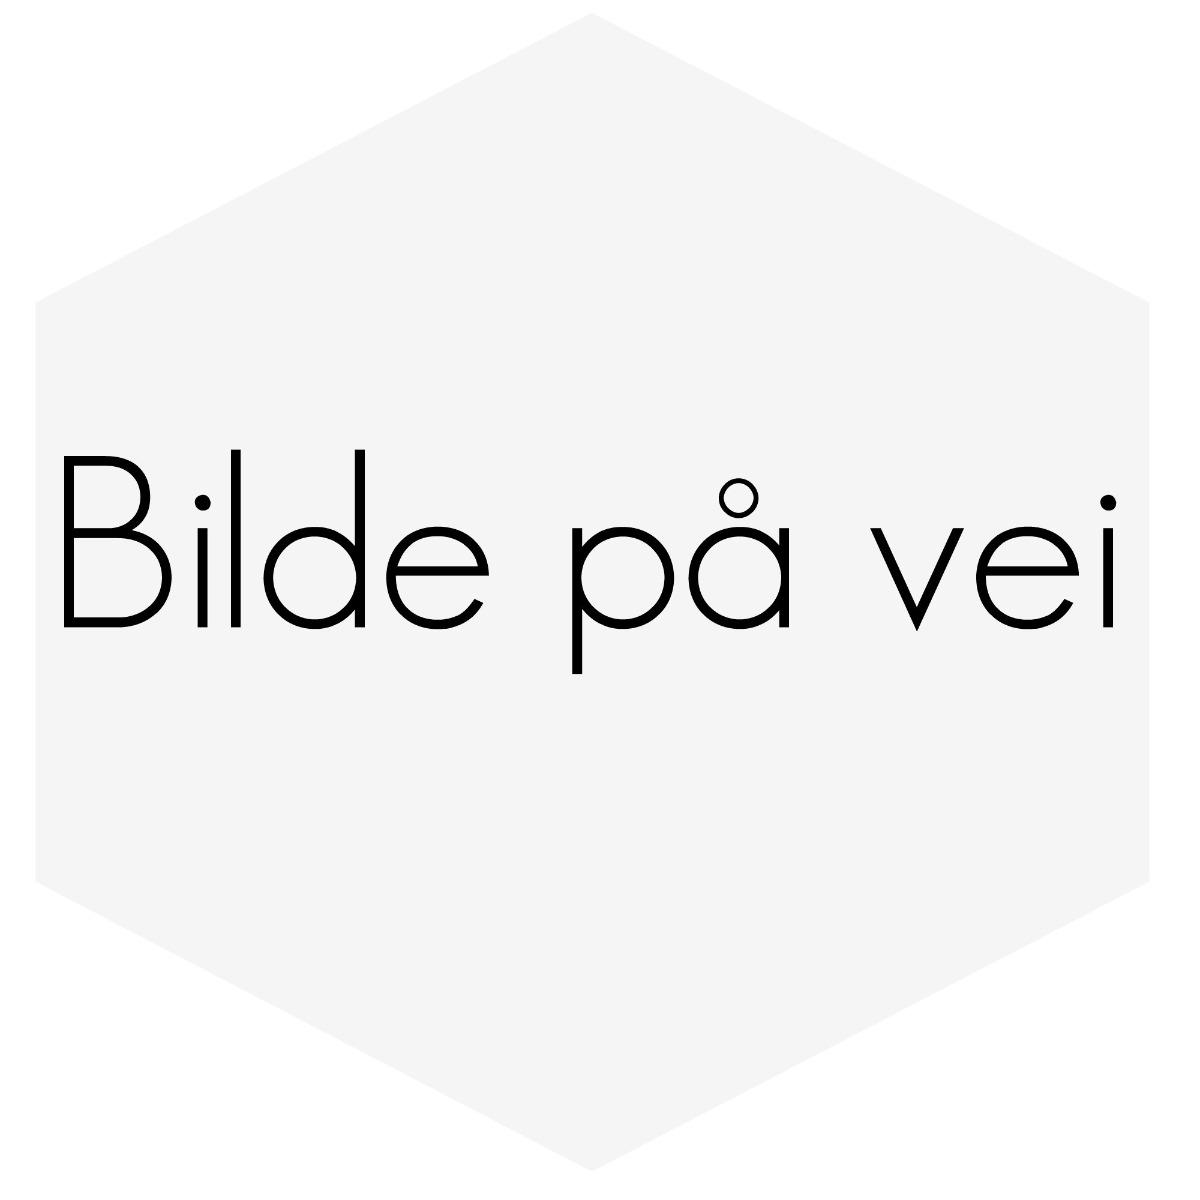 SILIKONSLANGE ARMERT BLÅ 0,25'' (6,3MM),pris pr meter